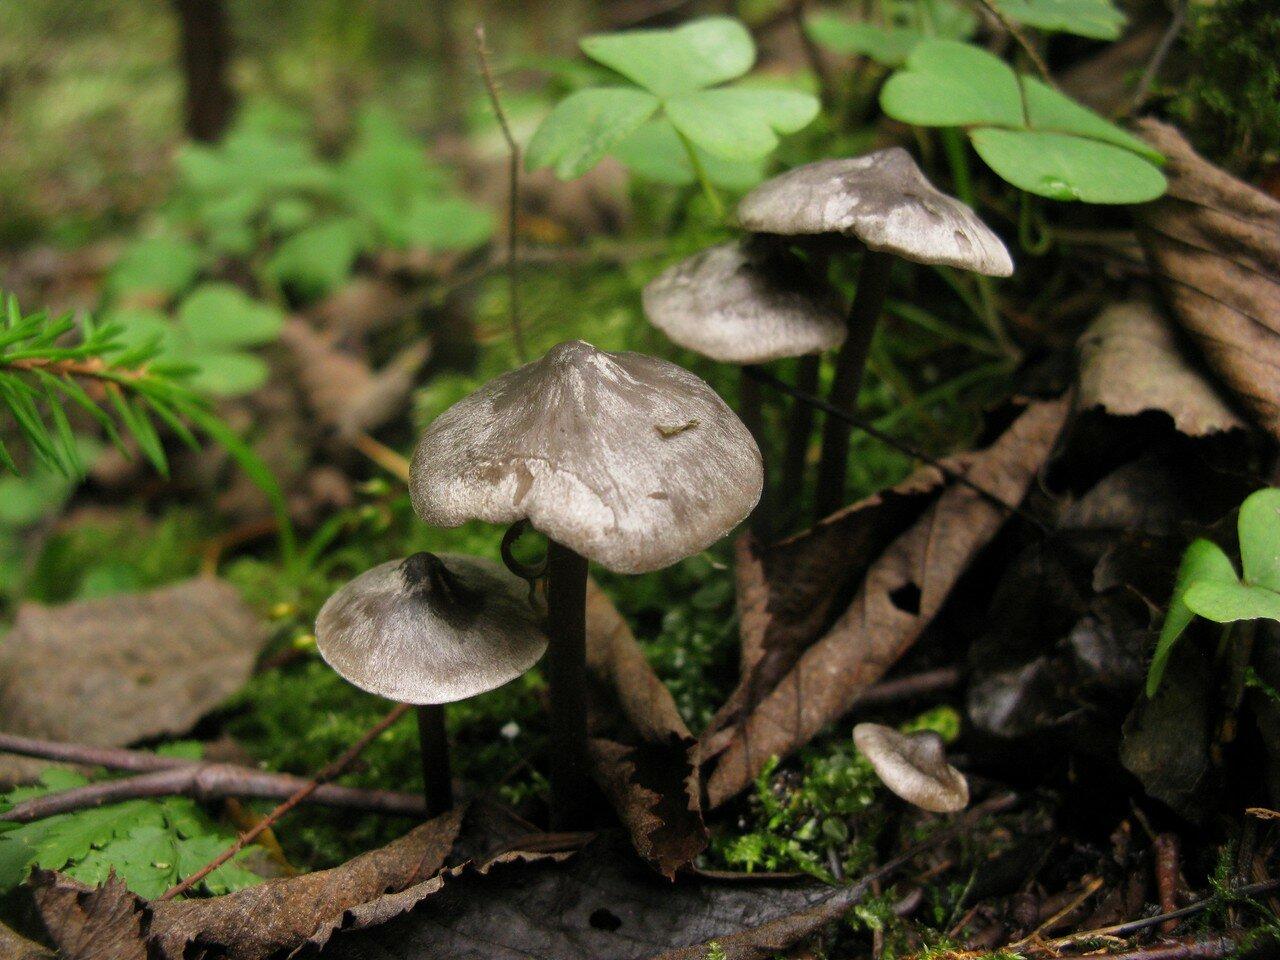 Тефроцибе вонючая (Tephrocybe rancida). Автор фото: Станислав Кривошеев